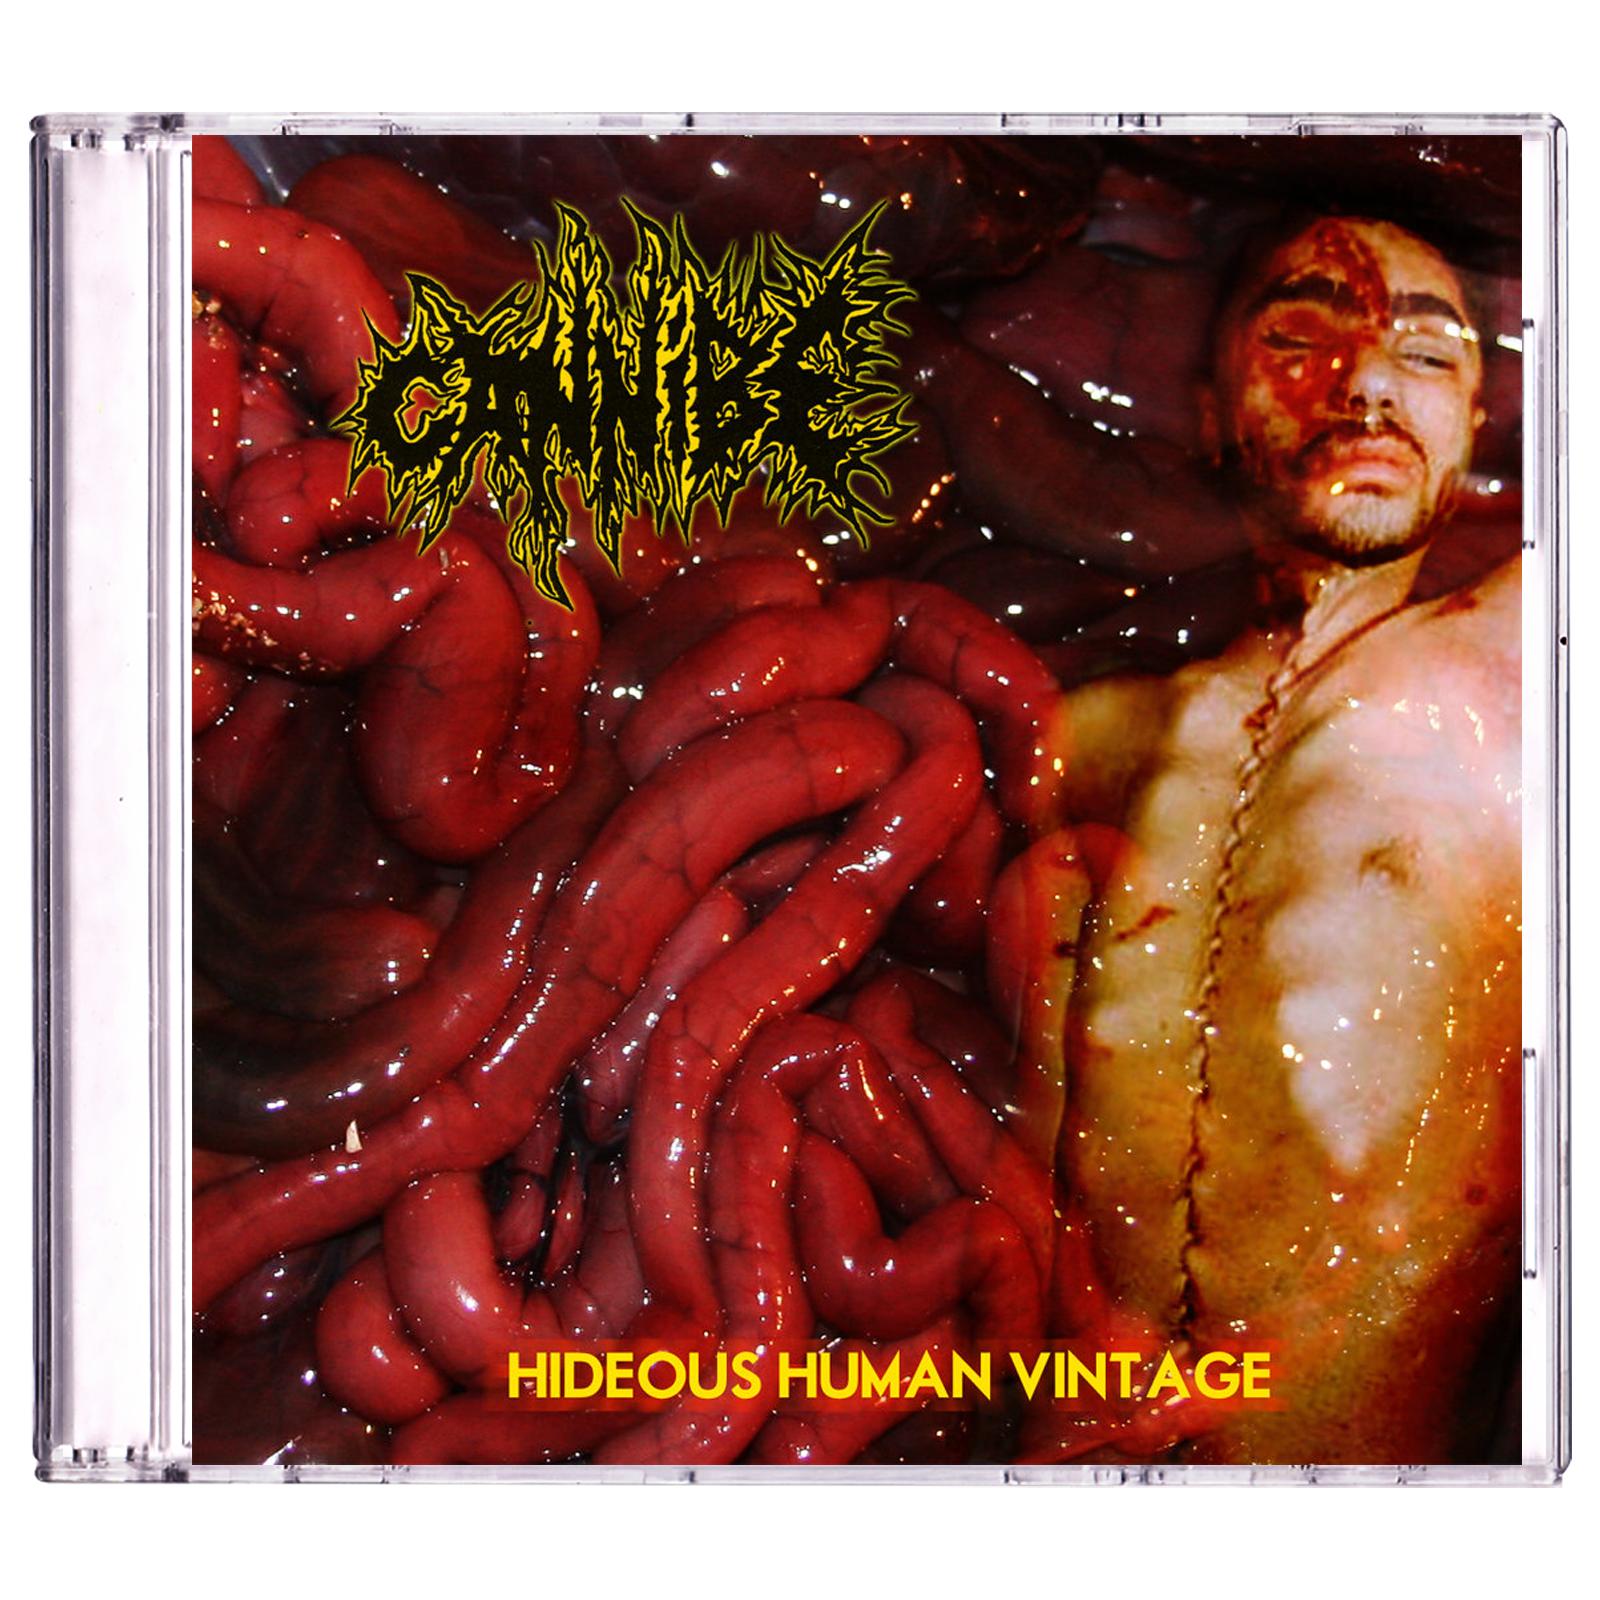 Cannibe 'Hideous Human Vintage' CD